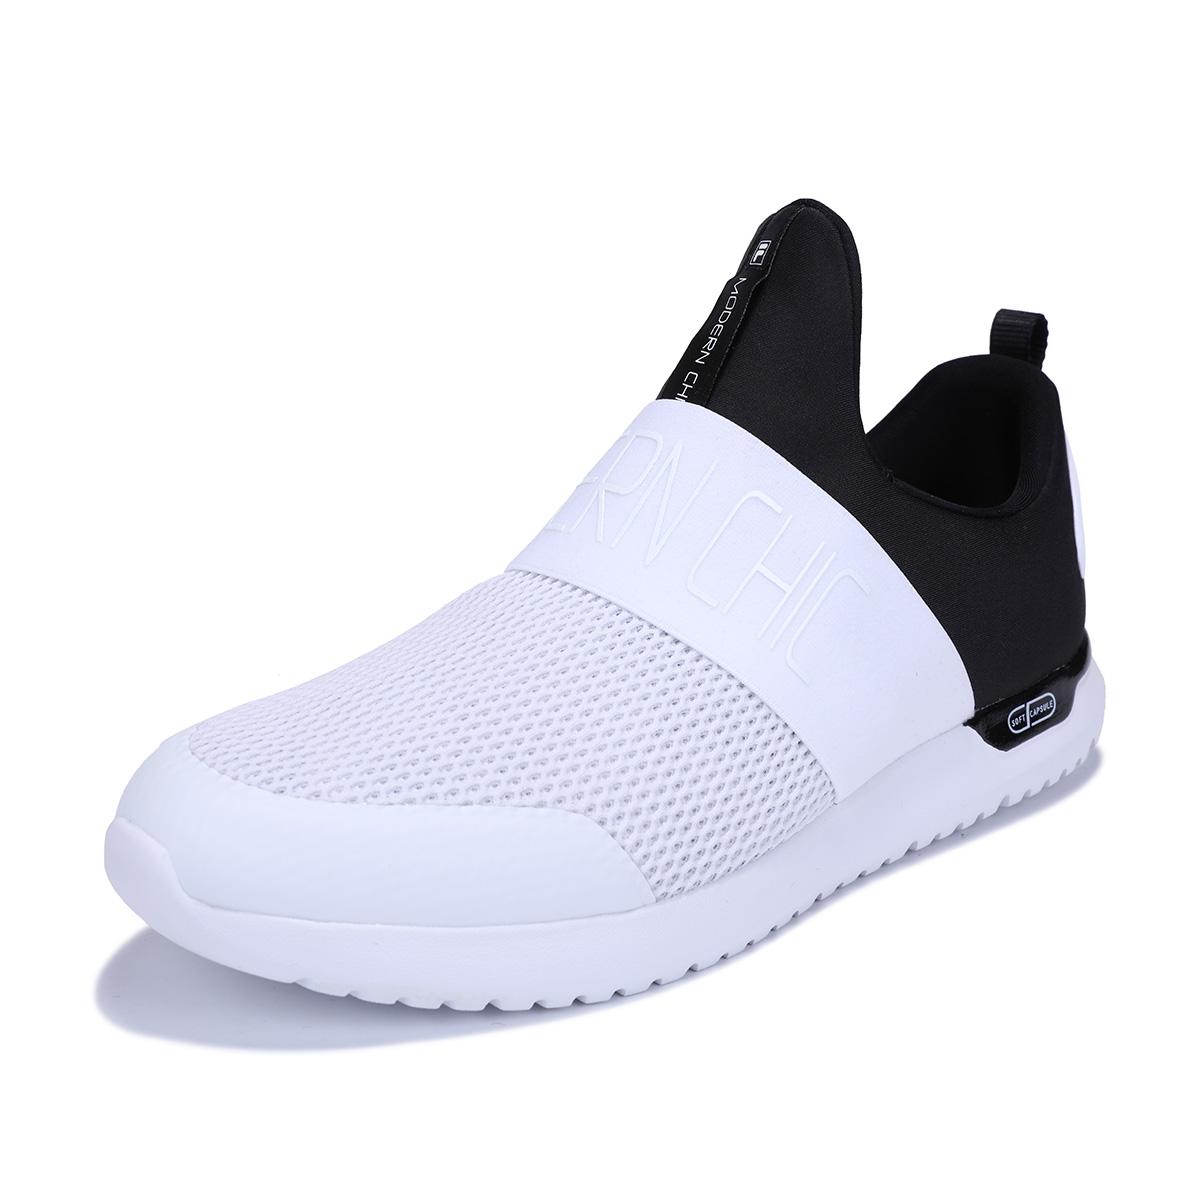 fila new shoes. fila fei lok women \u0027s shoes 2017 summer new cross - border simple hit fila a